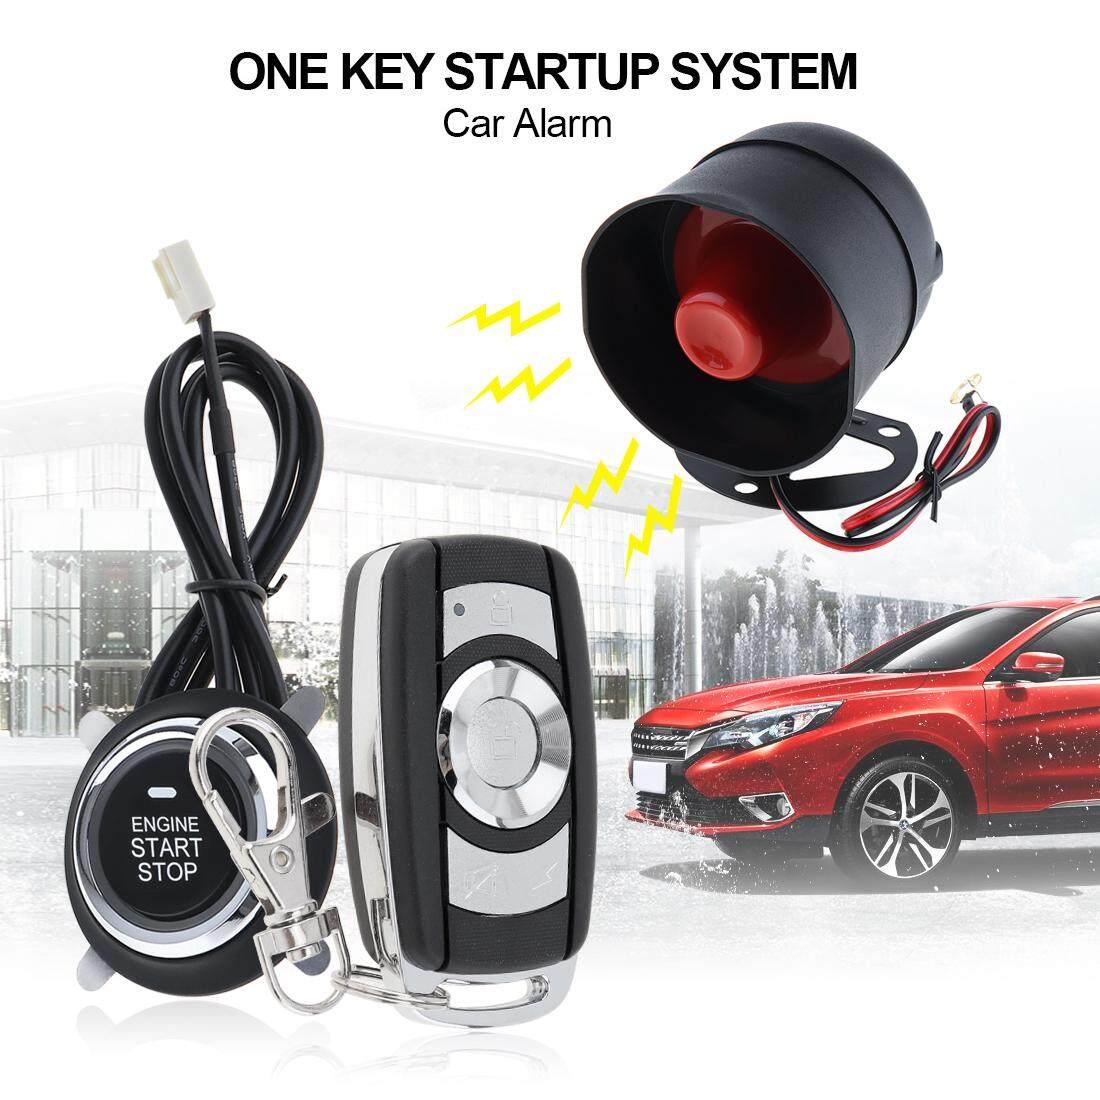 Sistem Alarm Aksesori Paket Centra Lock Full Set Central Pintu Mobil Universal Car System Remote Start Stop Engine With Auto And Keyless Entry